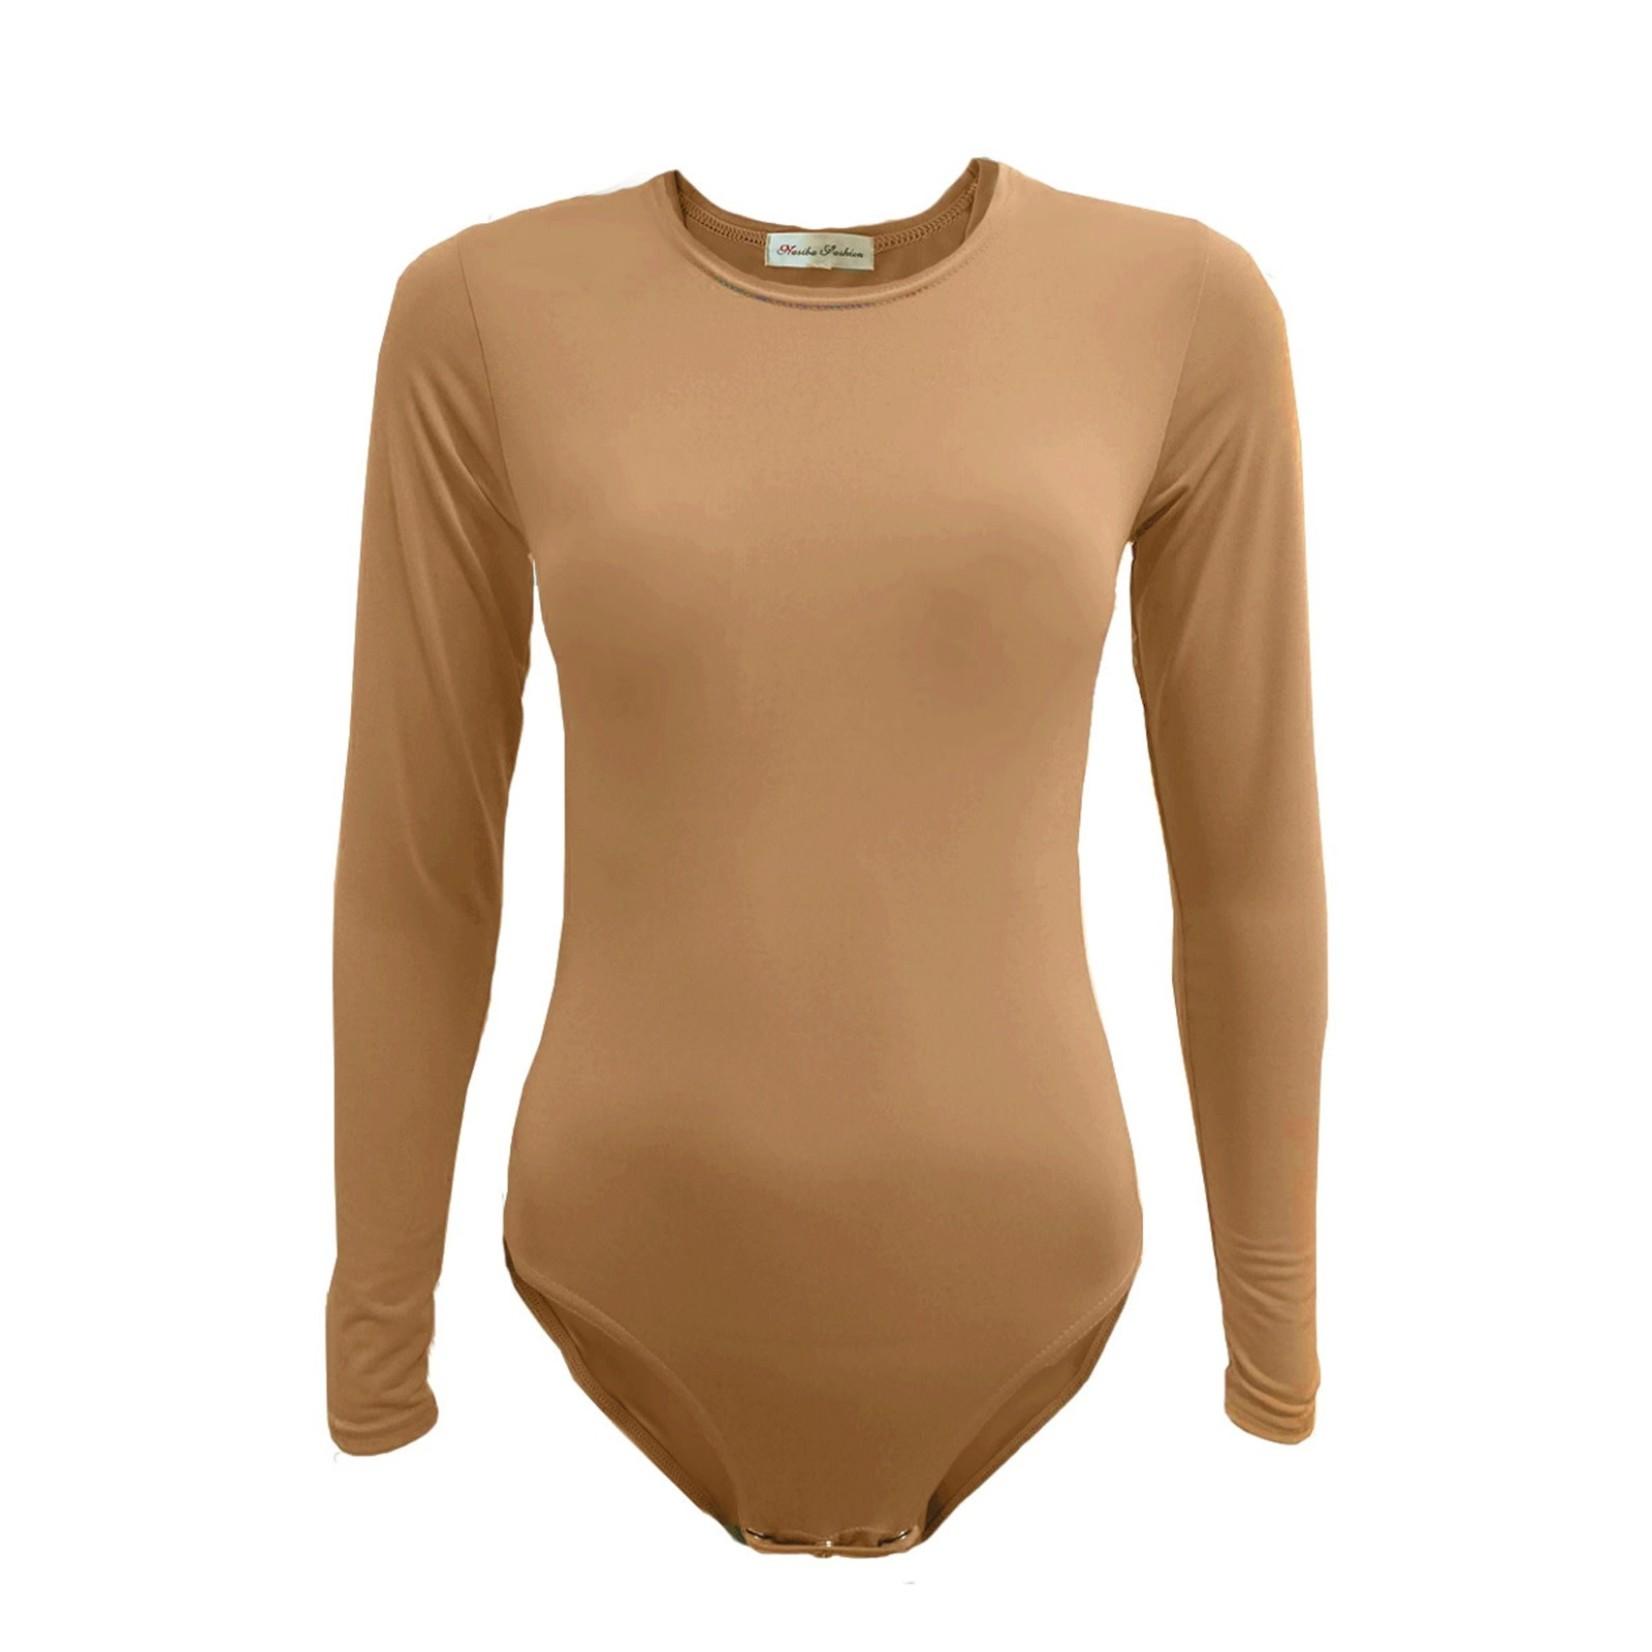 Nasiba Fashion Gold Bodysuit